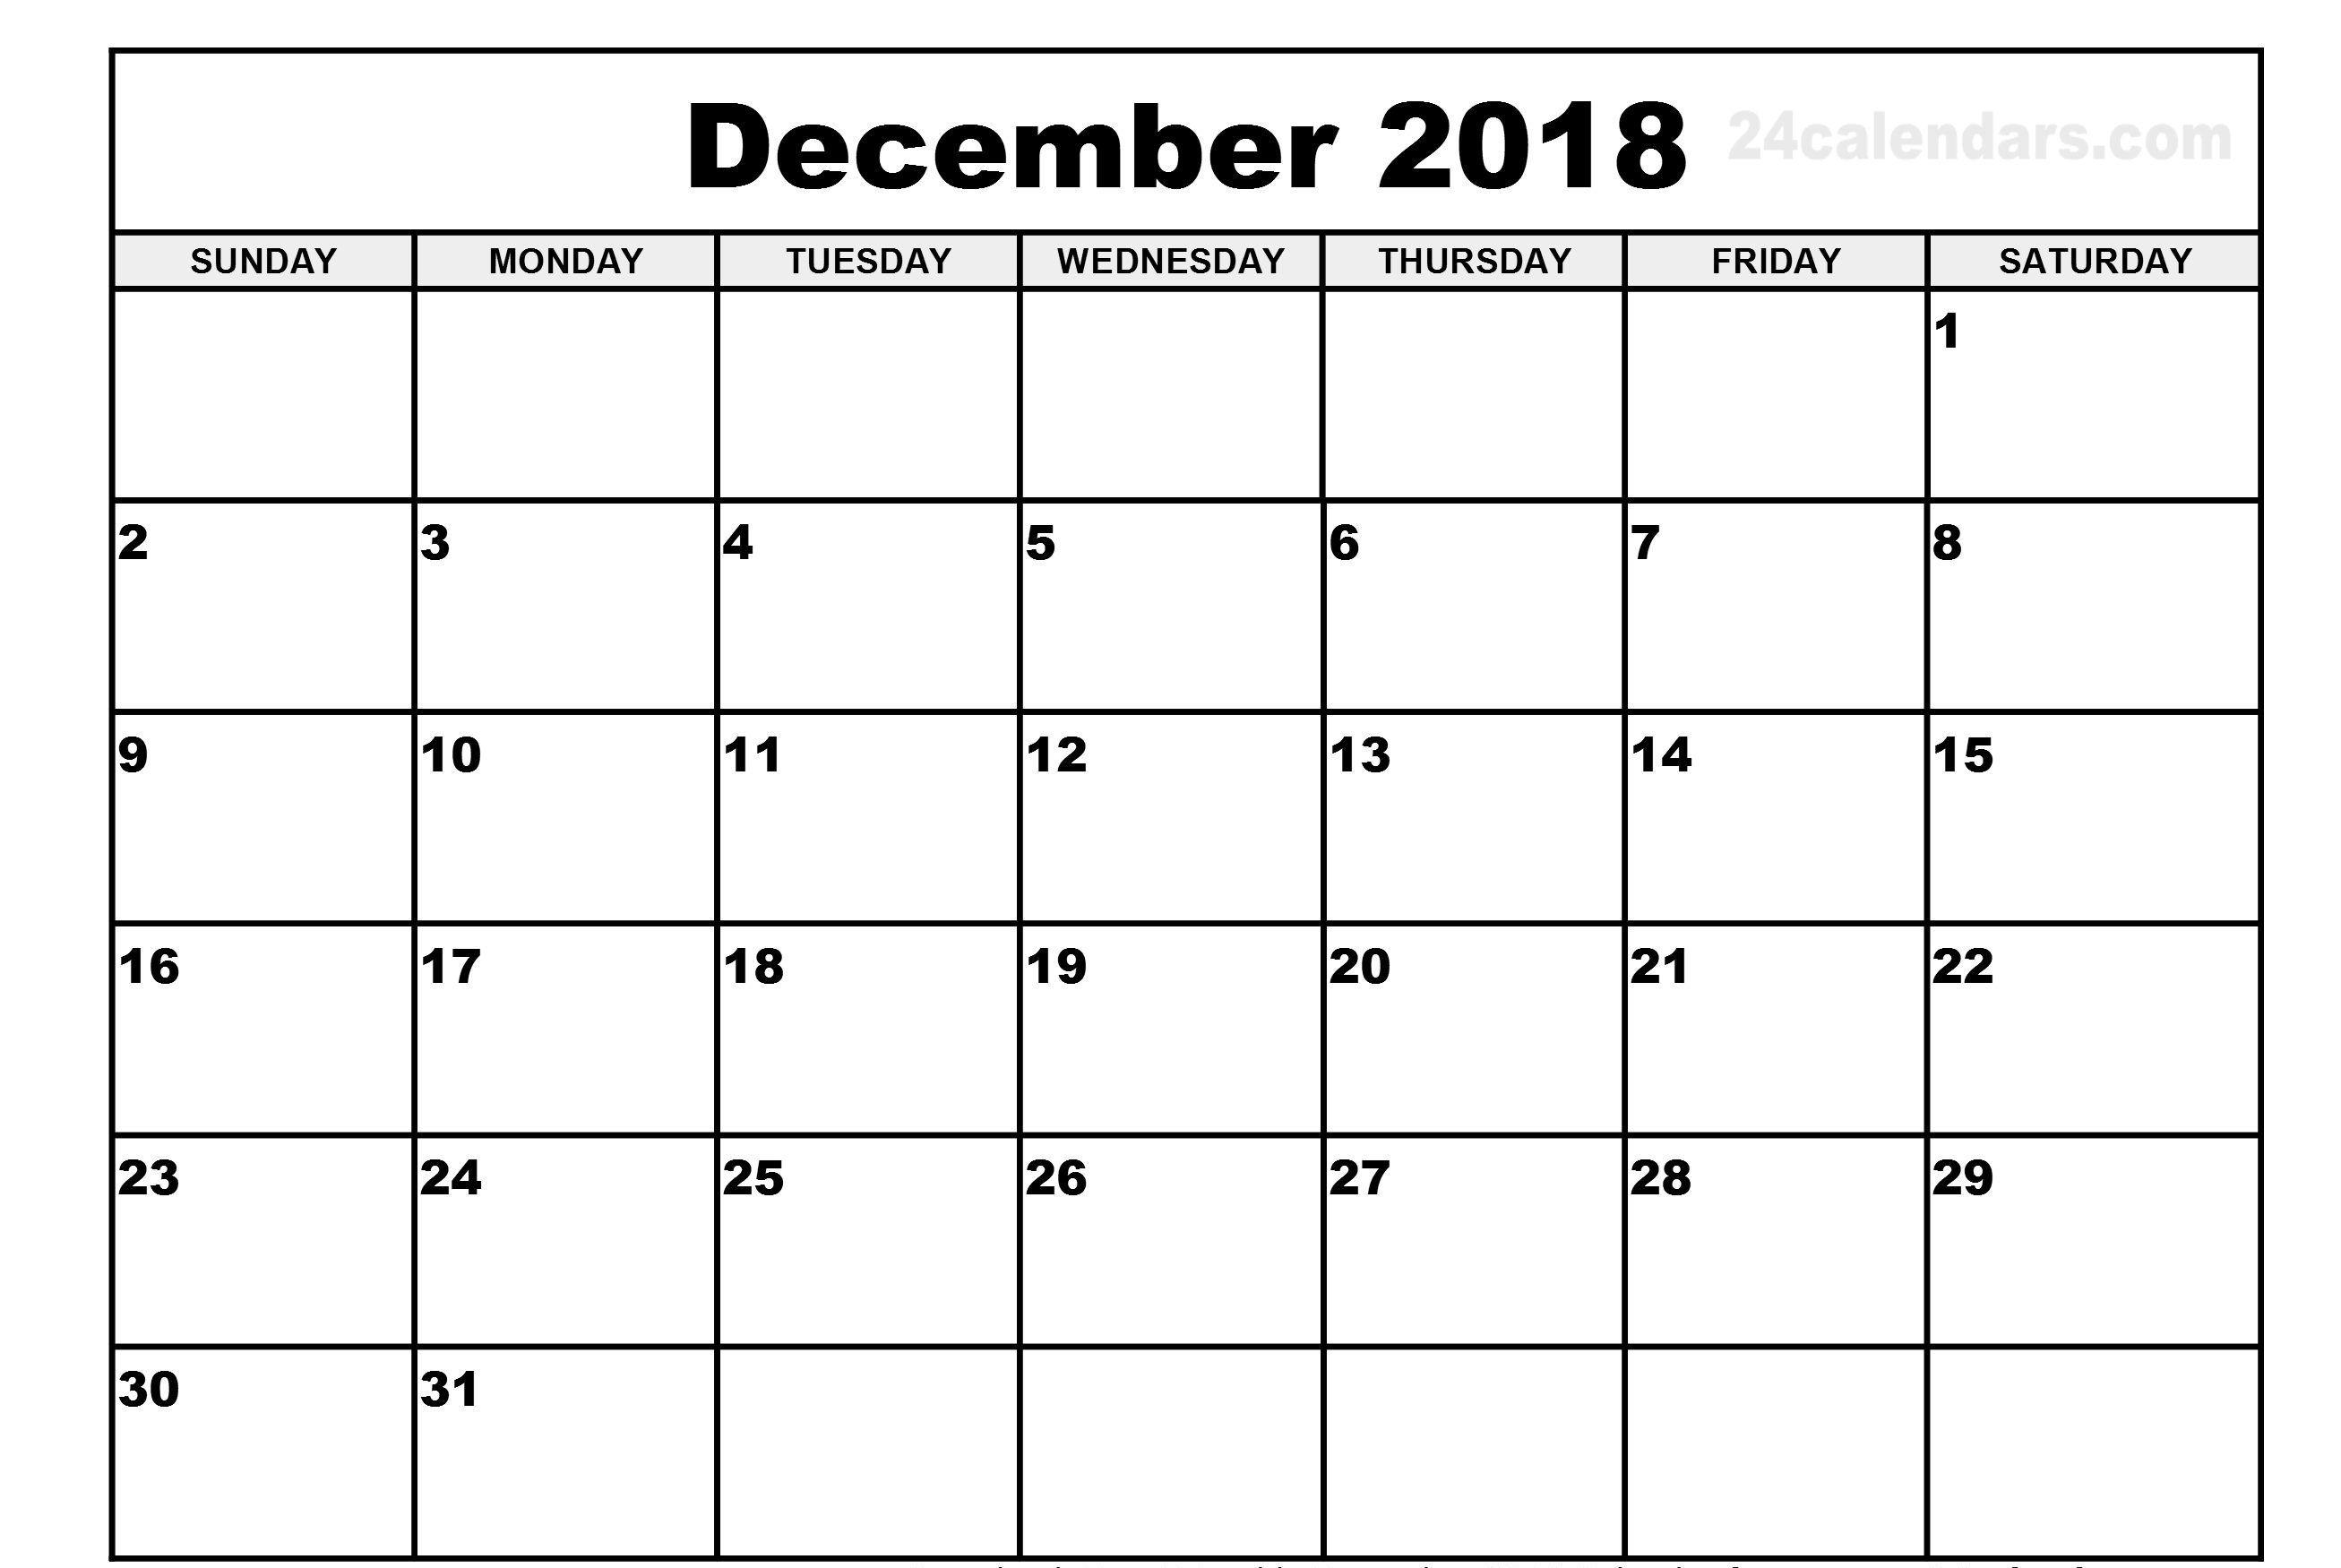 December Weekend Calendar 2018 Printable | Calendar Format